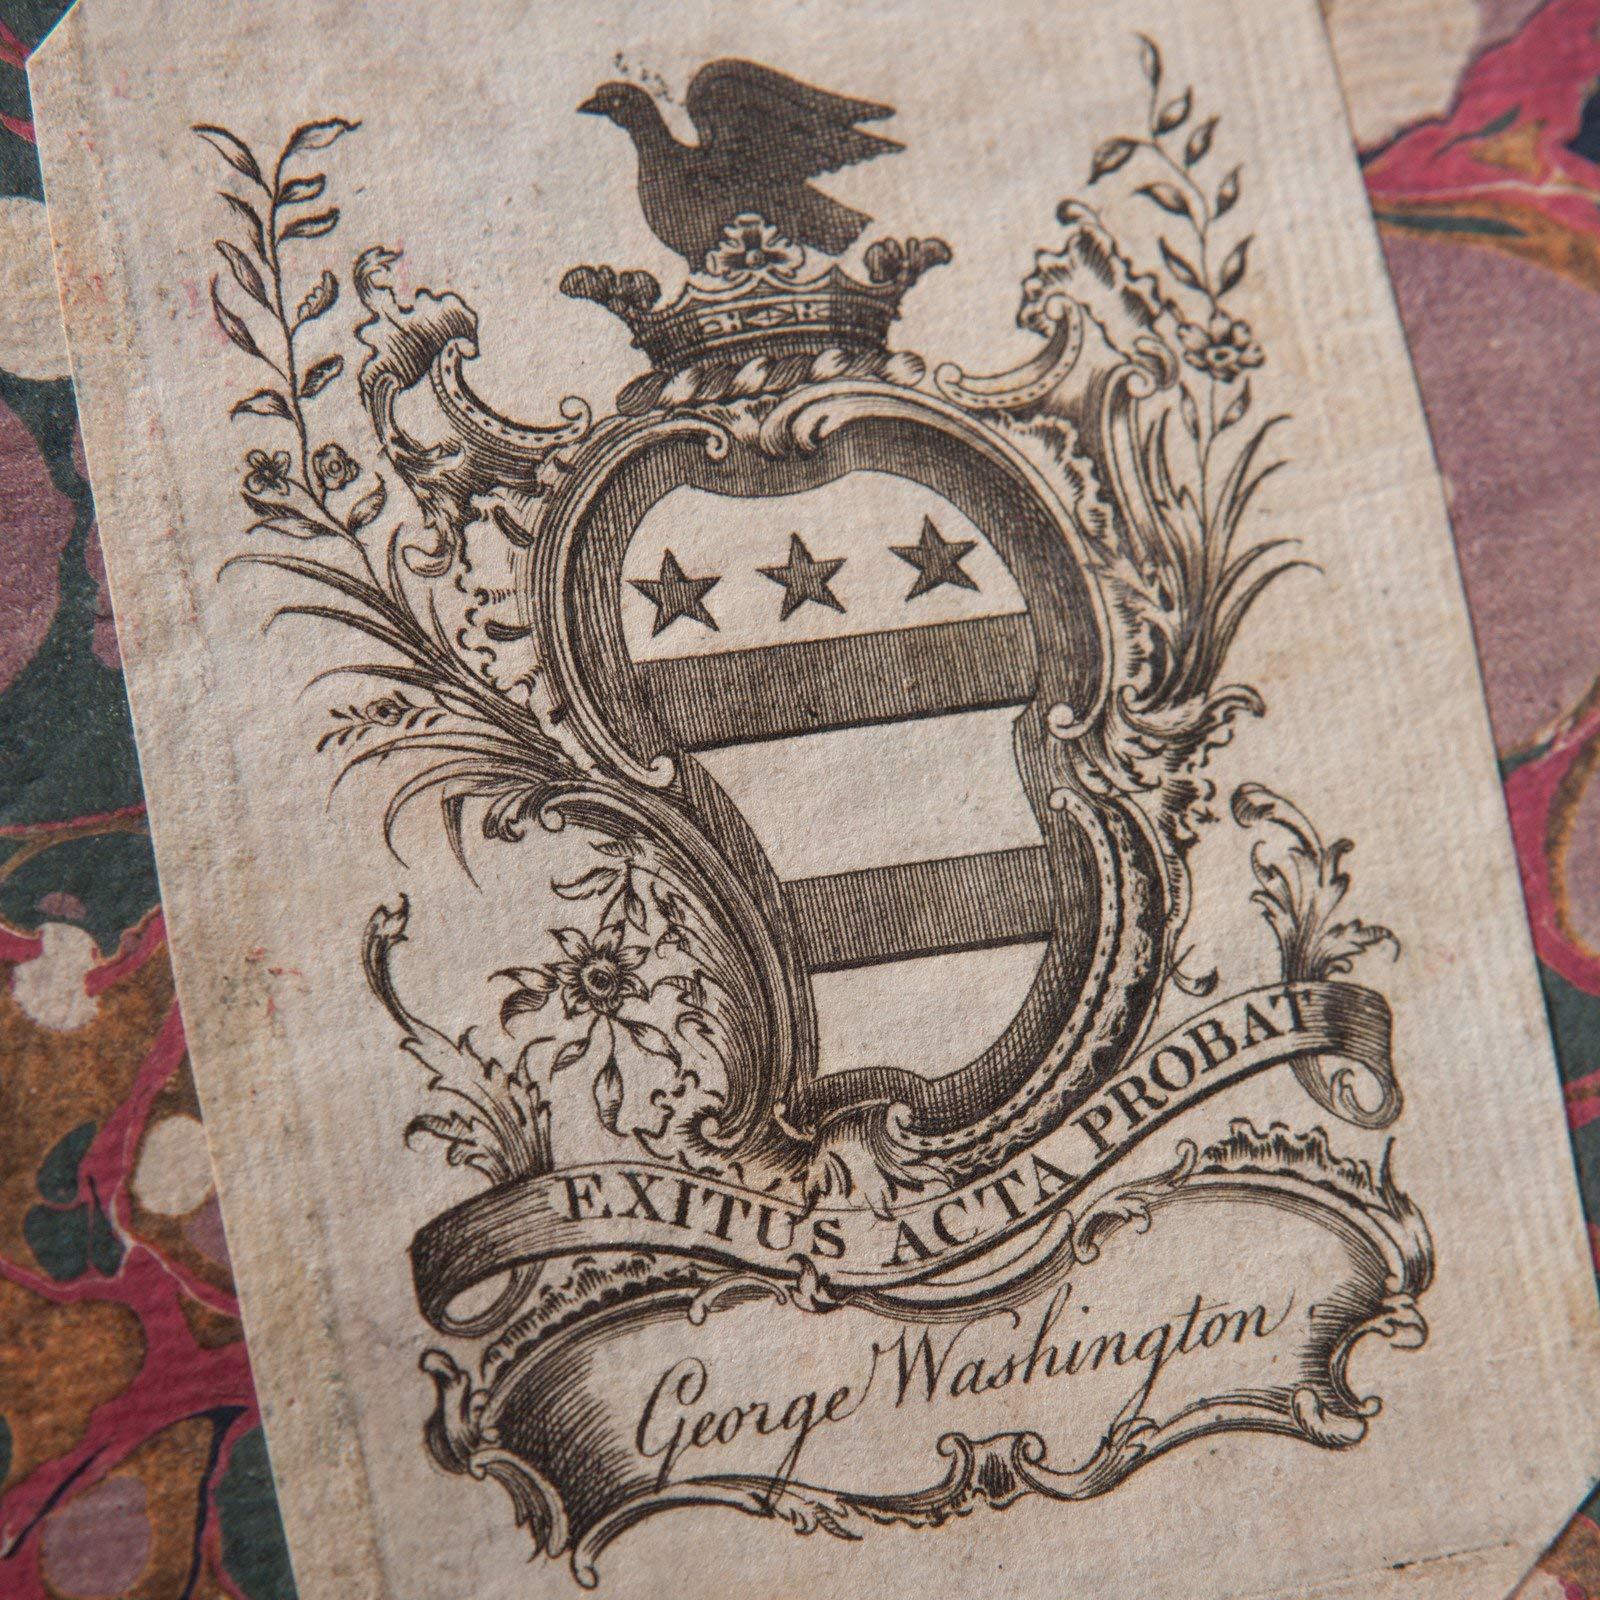 George Washington's Mount Vernon Acts of Congress 1789: Special Edition by George Washington's Mount Vernon (Image #3)